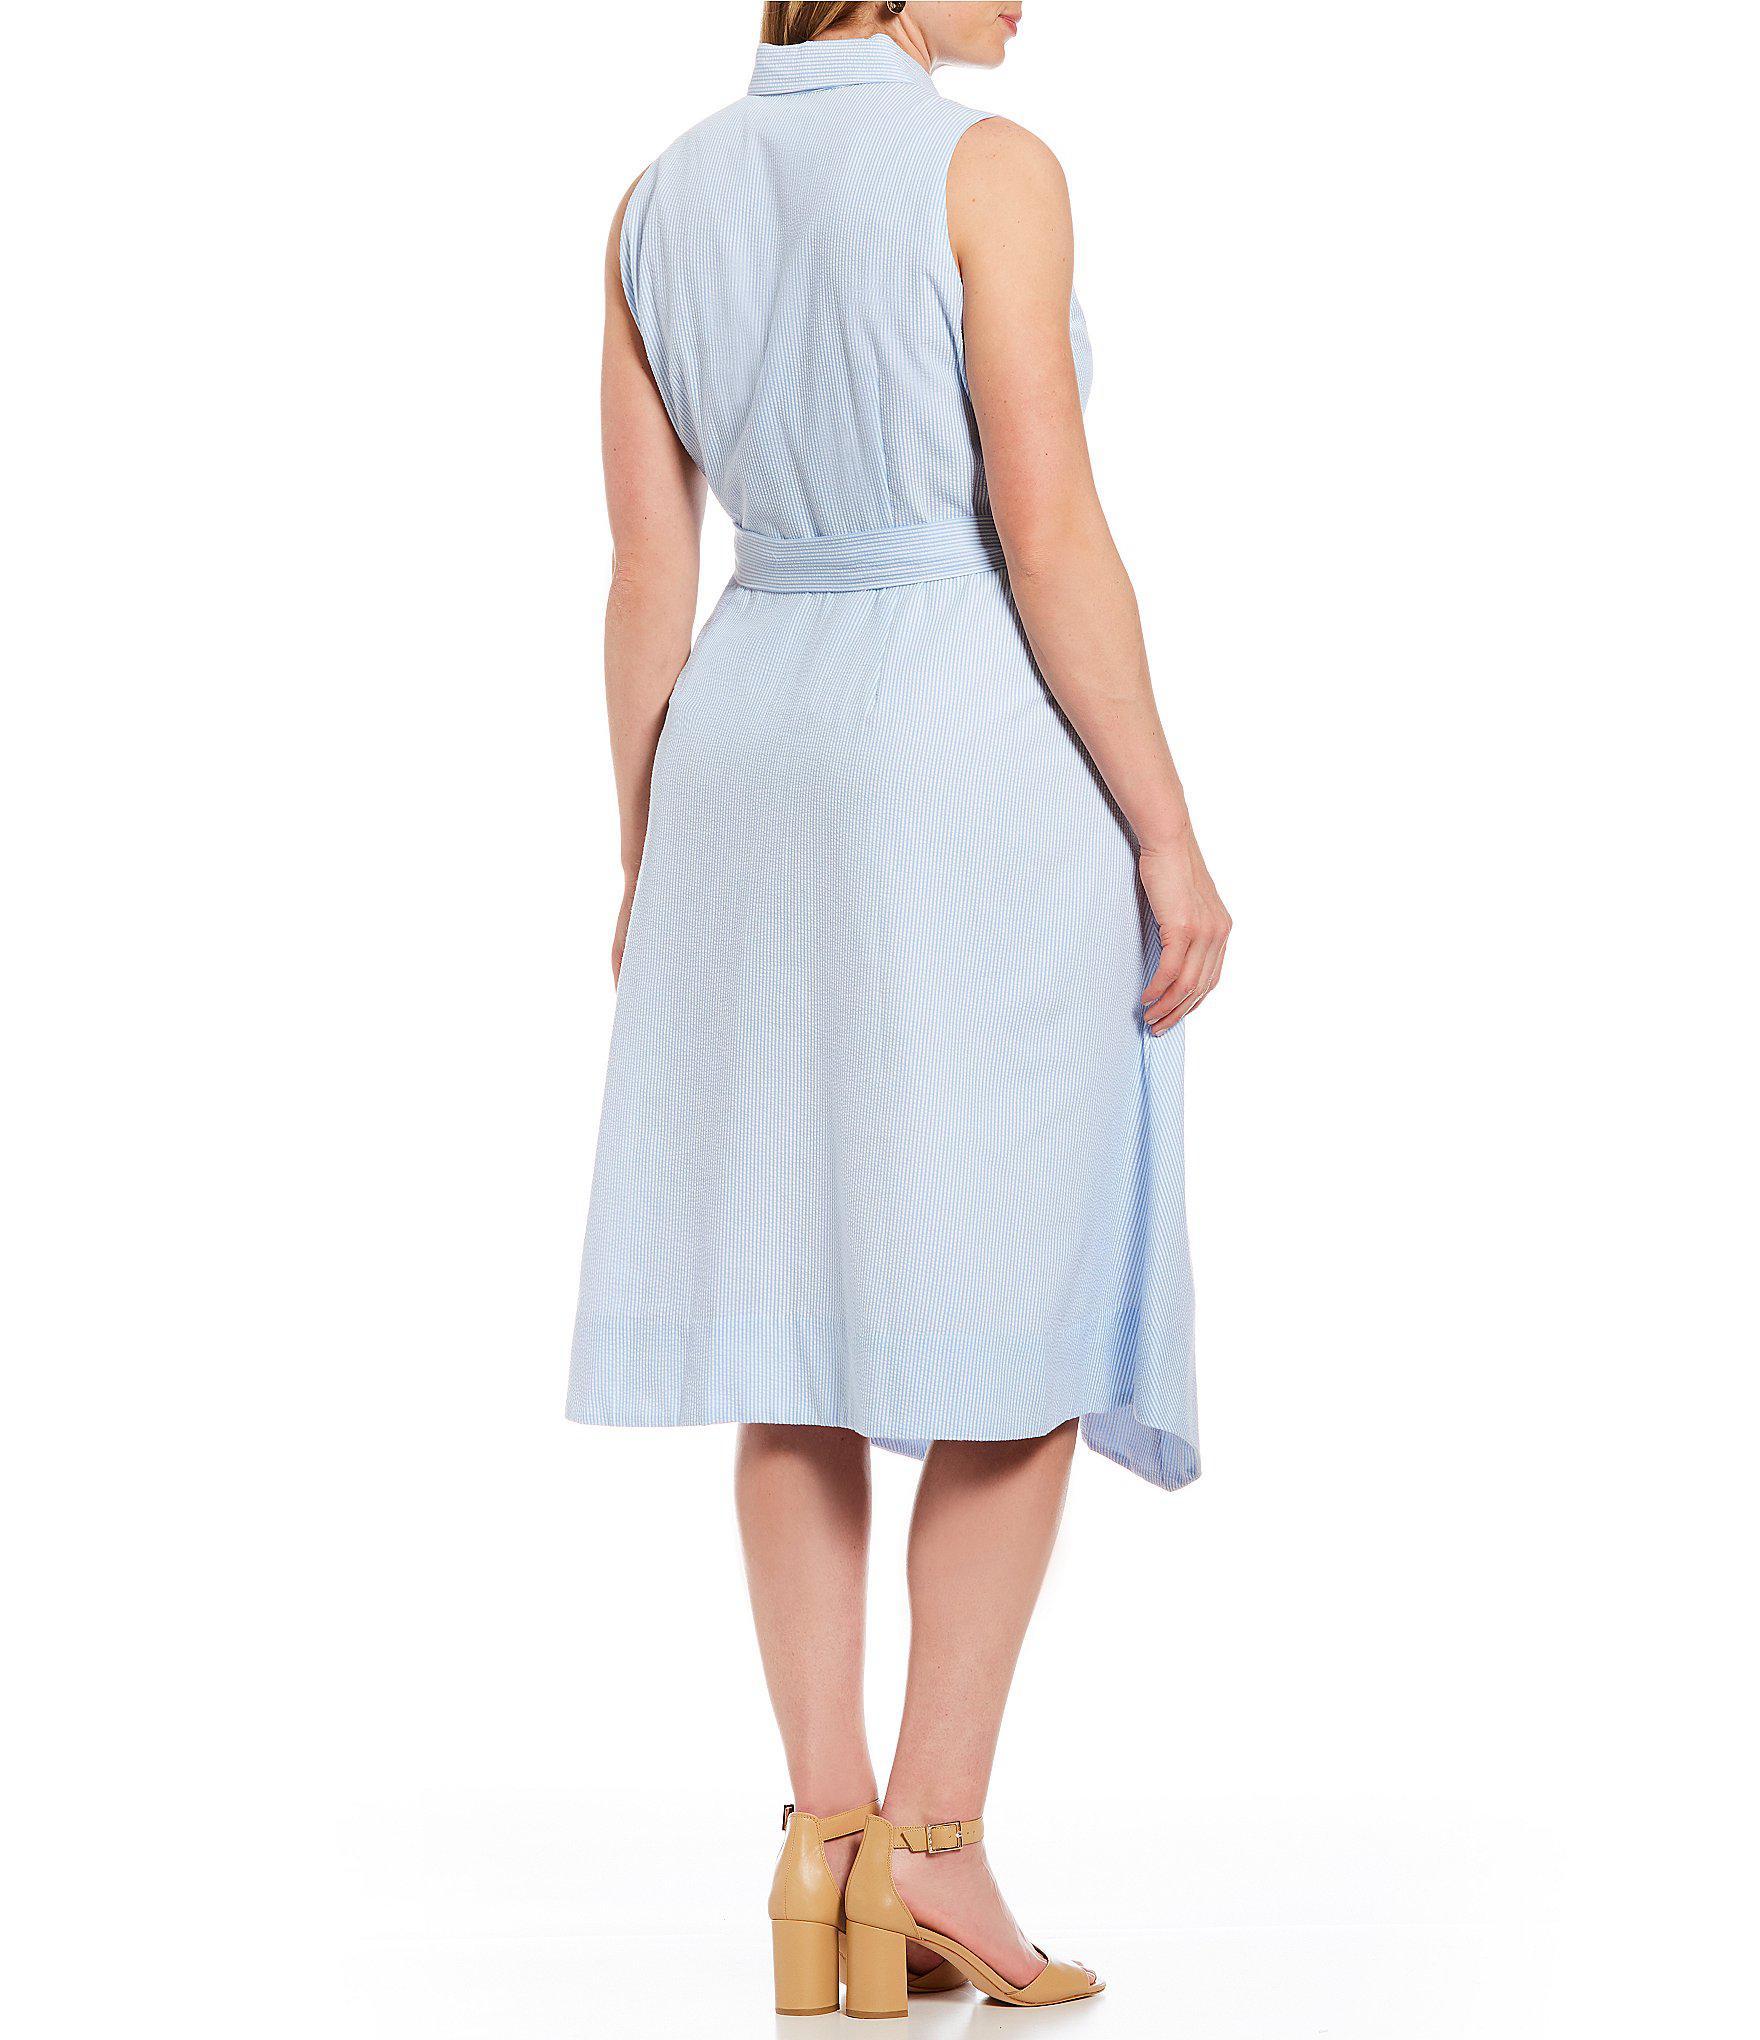 Dillards Petite Plus Size Dresses | Hut Bar